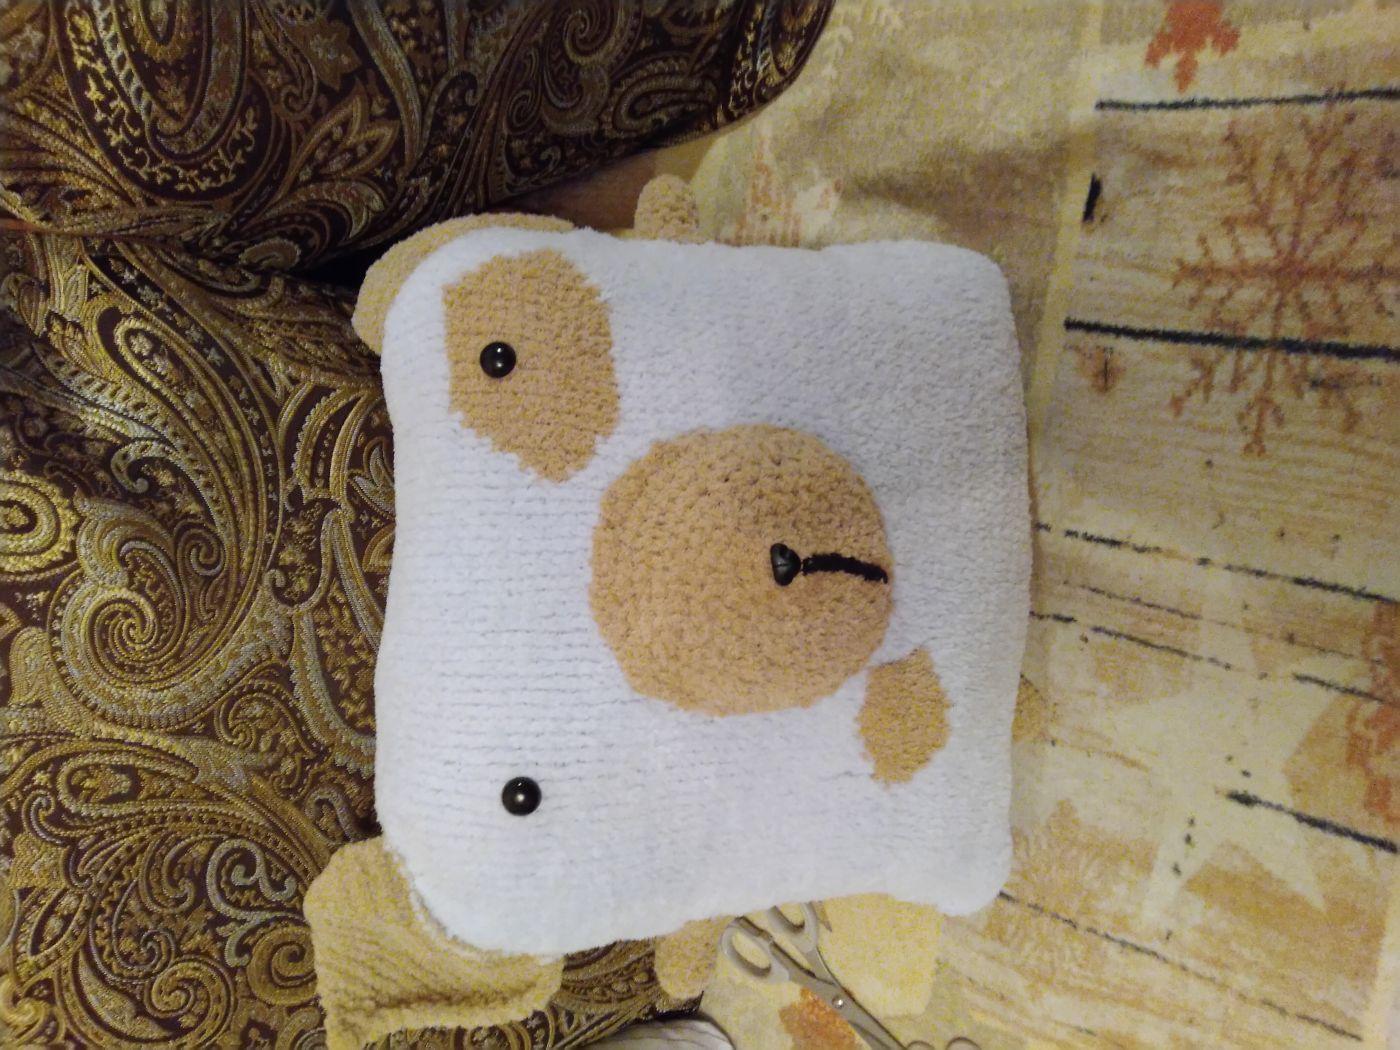 Декоративная подушка игрушка Собачка. Подушка в детскую. Подарок ребенку.